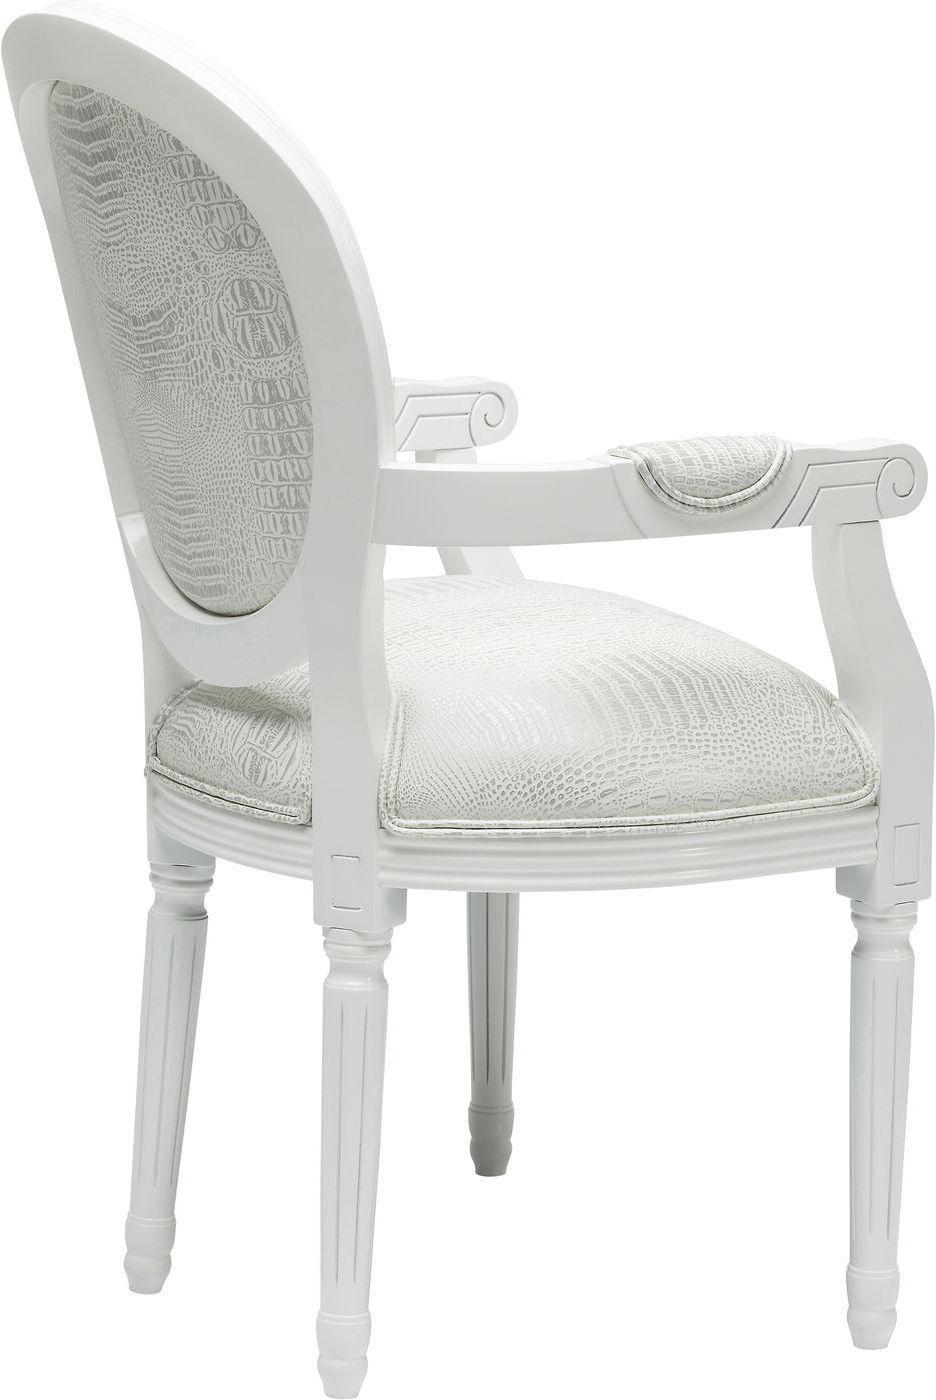 Stuhl mit armlehne gastro louis white kare design kaufen for Stuhl kare design